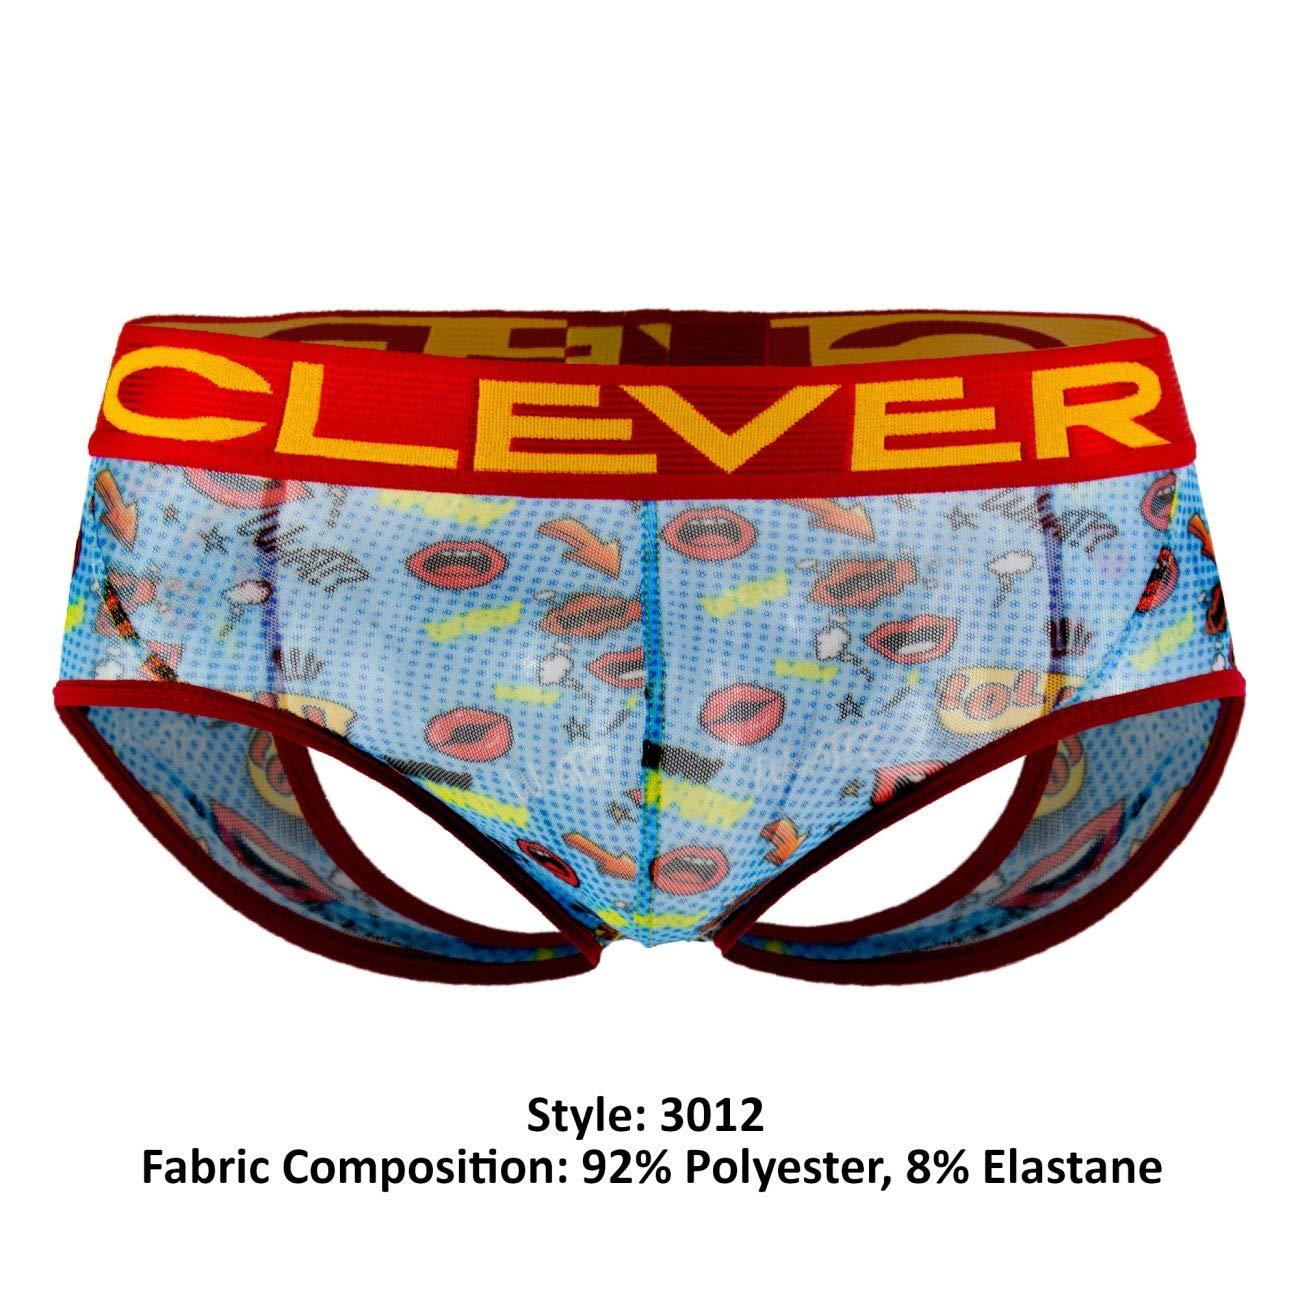 Clever Masculine Mens Jockstrap Underwear for Men